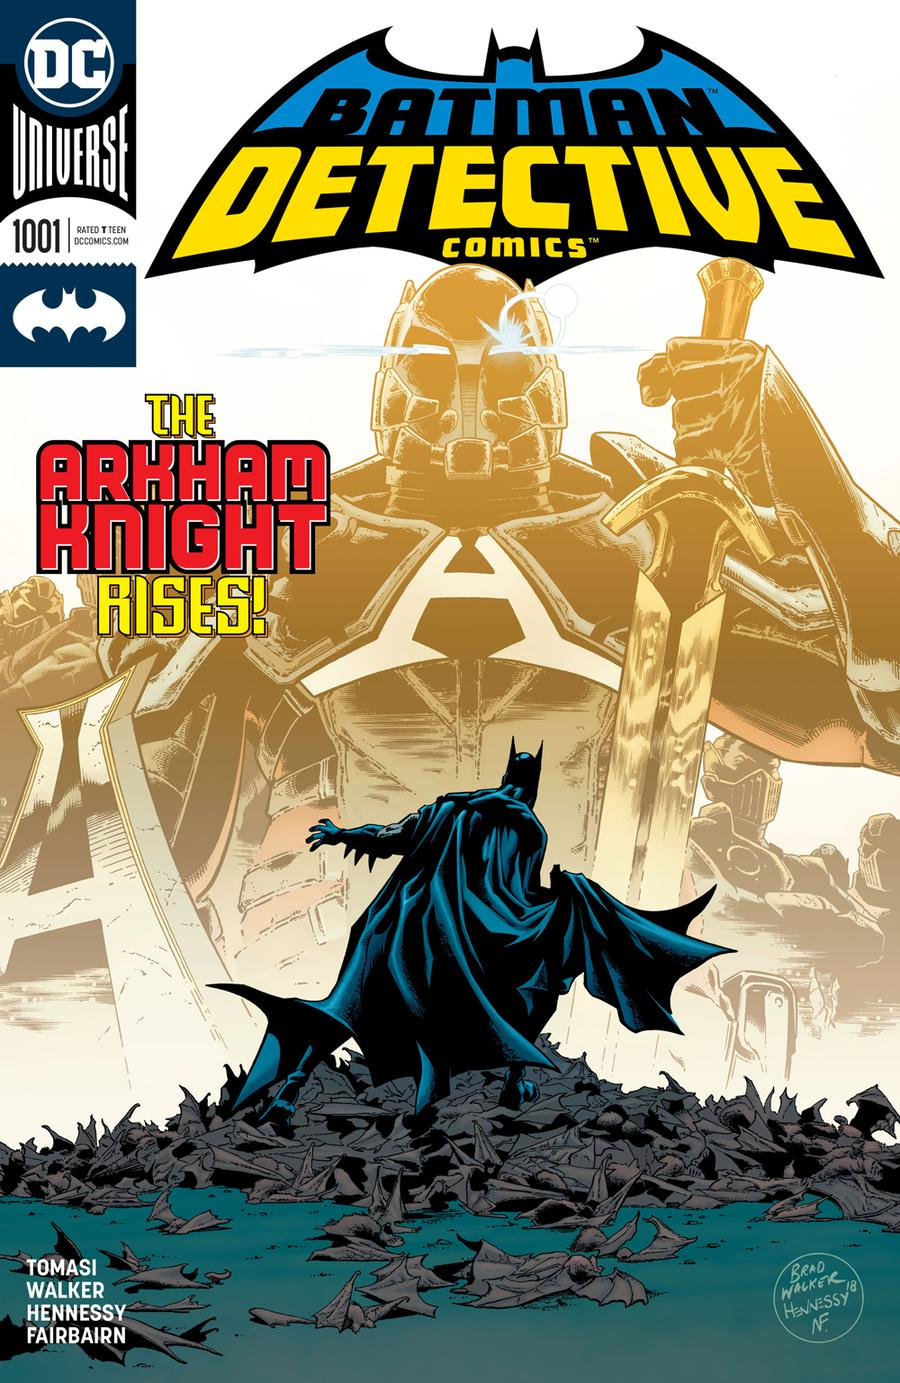 The Long Boxers - Detective Comics 1001